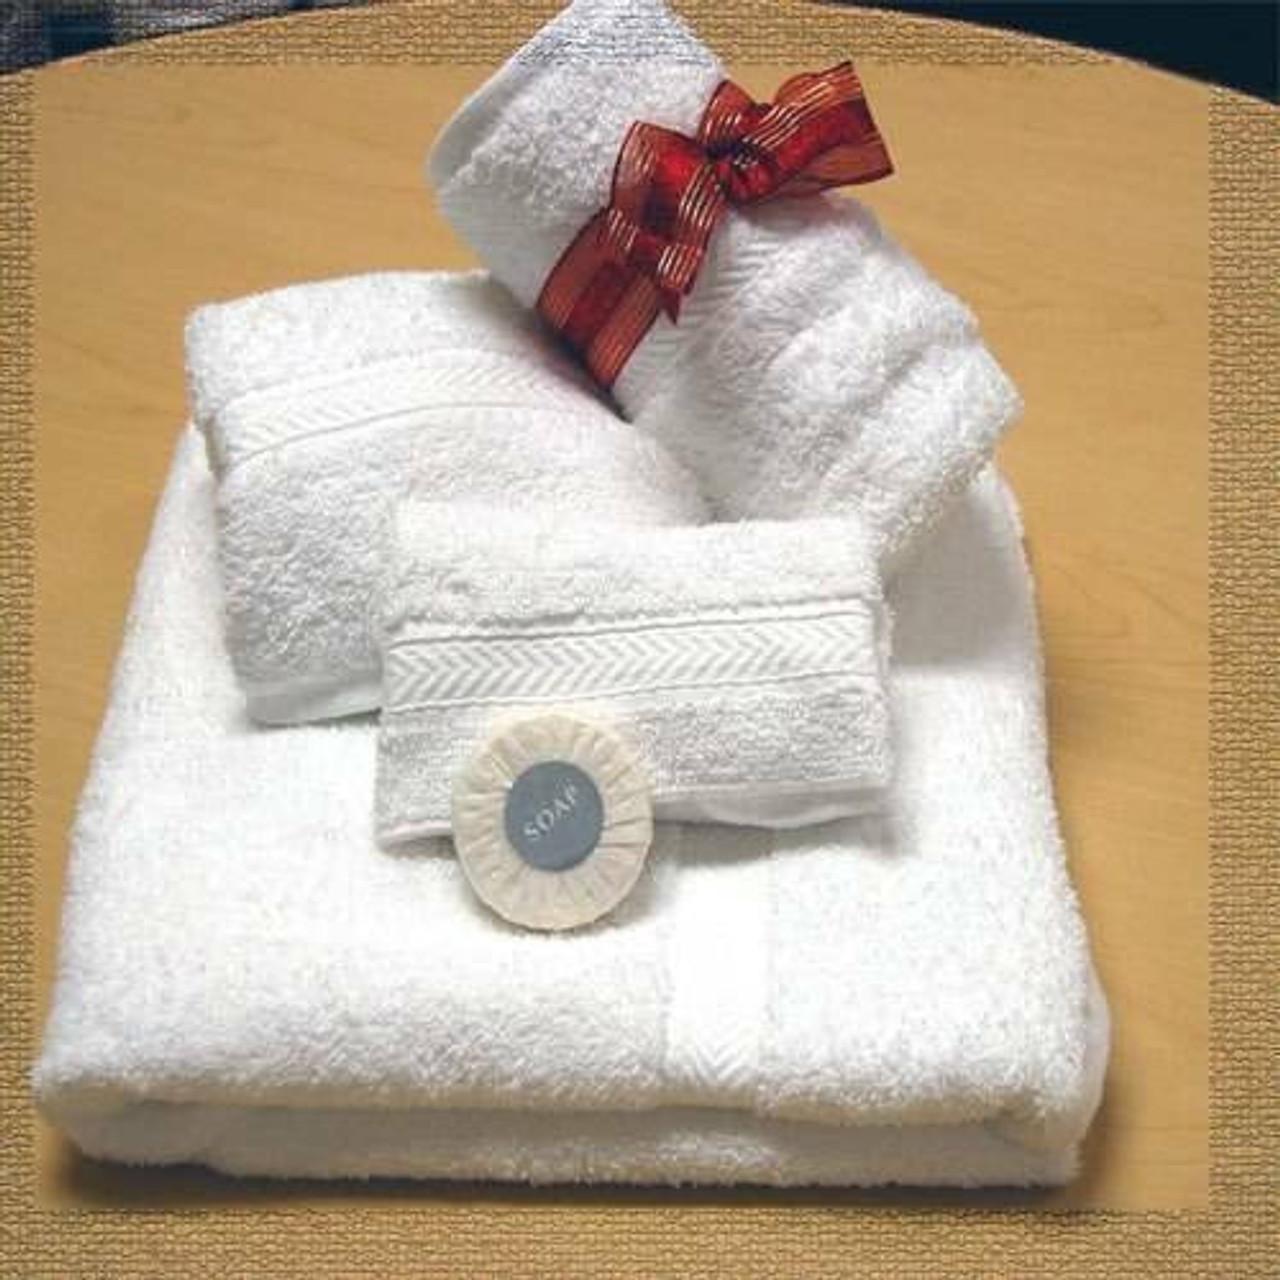 Ganesh Mills or Oxford Super Blend Ganesh Mills or Oxford Gold Dobby Overlock Towels